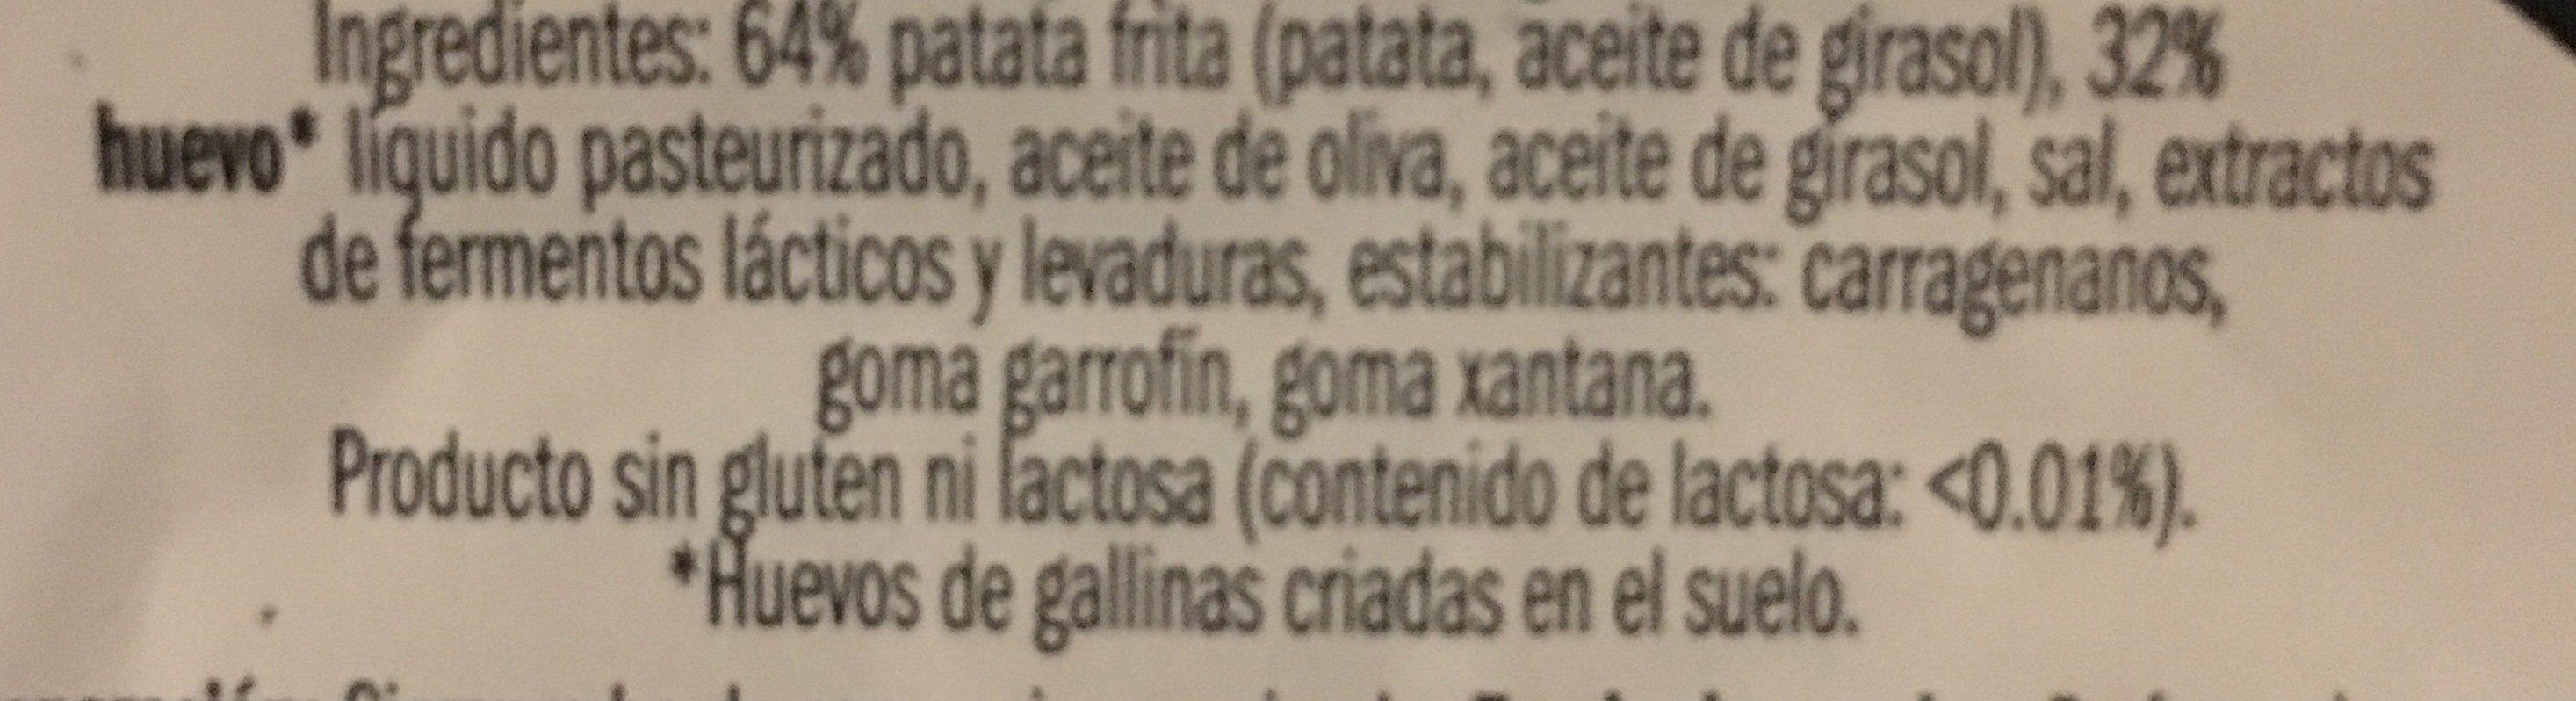 Tortilla de patata - Ingrédients